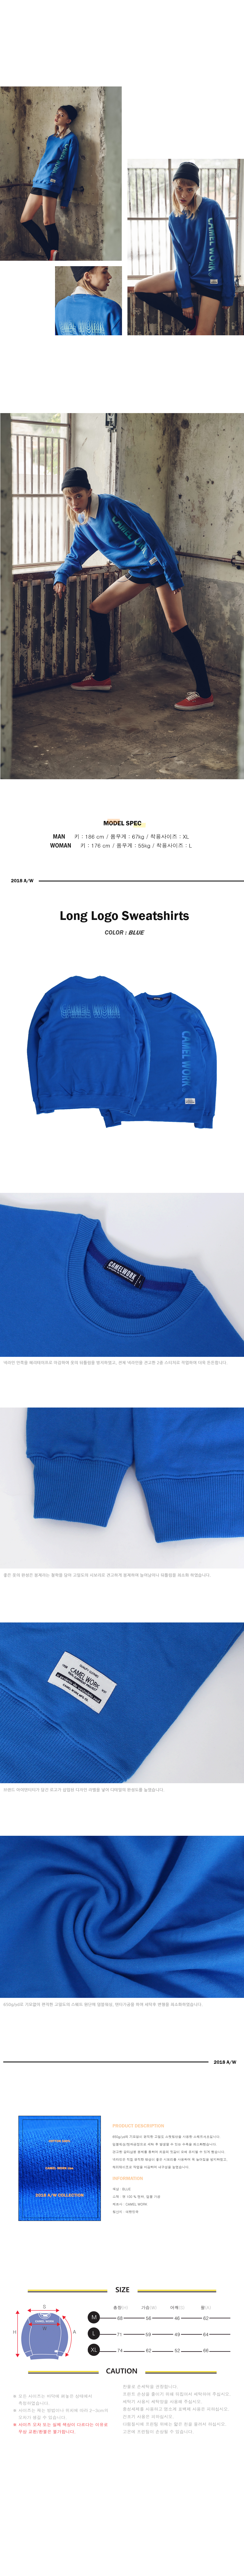 long logo Sweatshirts bl2.jpg